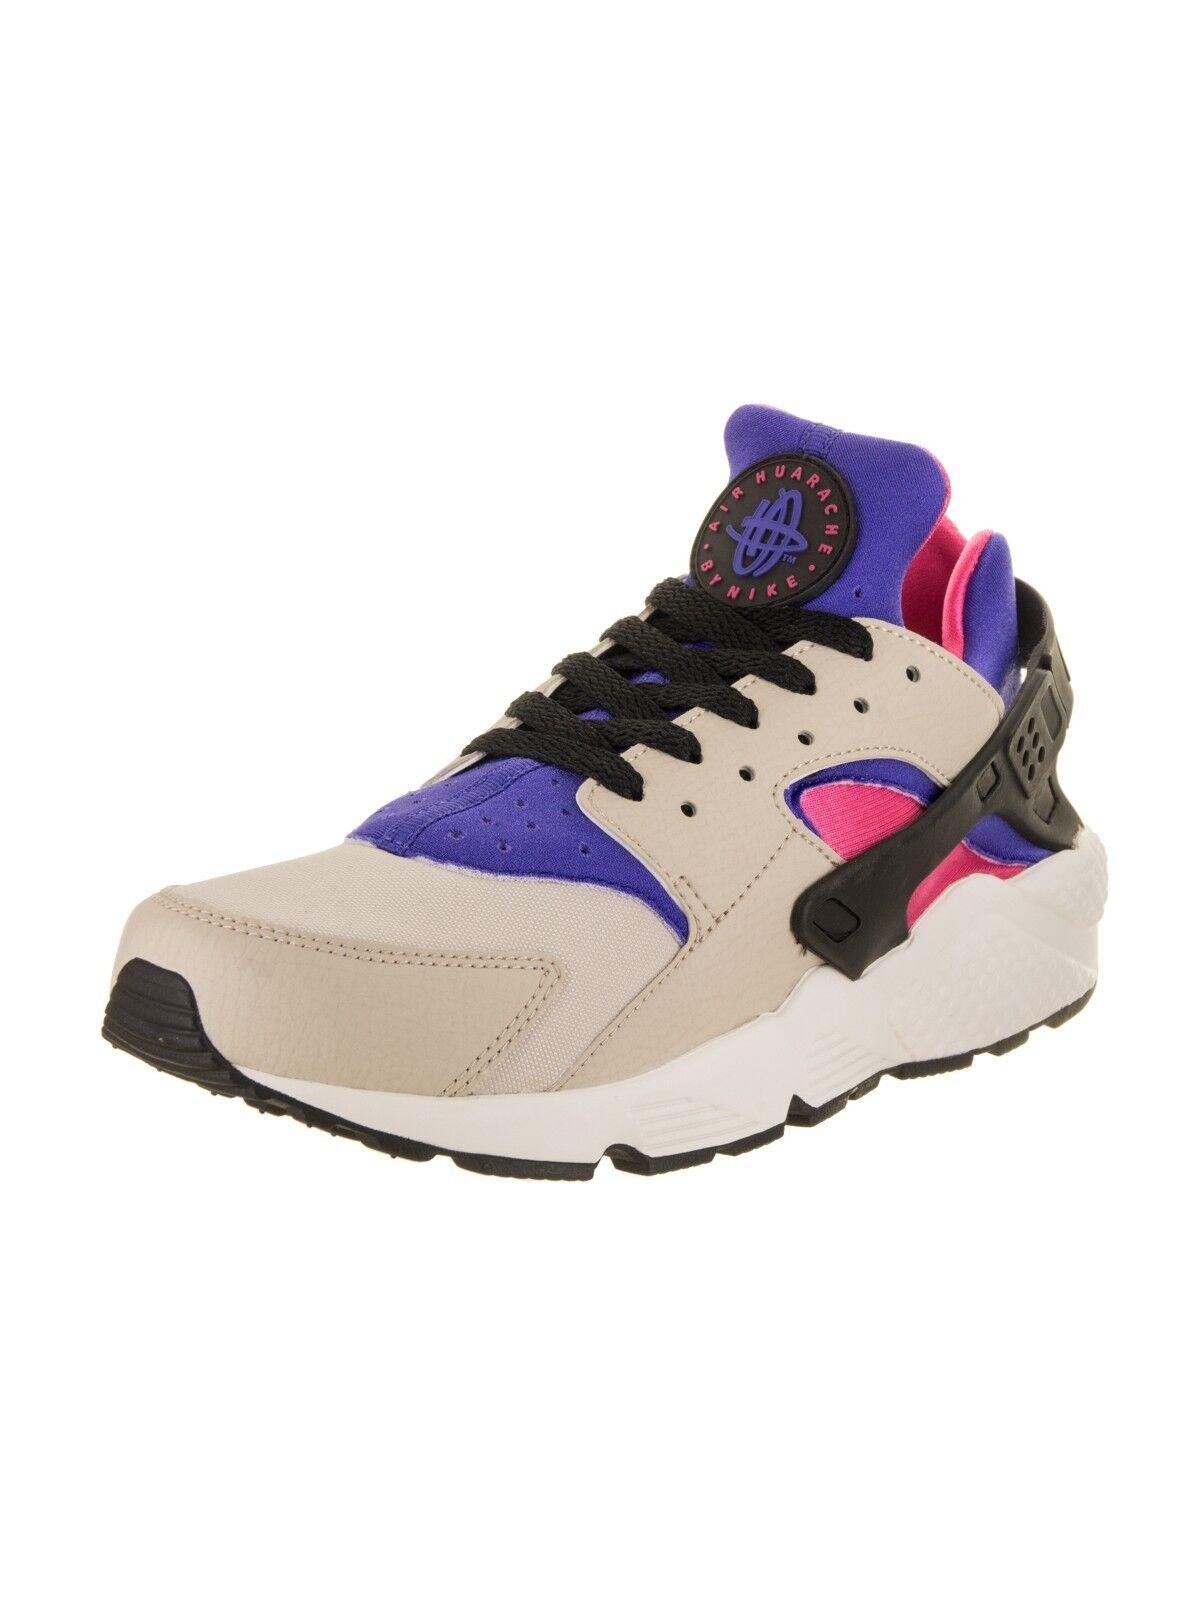 Nike Air Huarache Desert Sand Persian purple White Black 318429-056